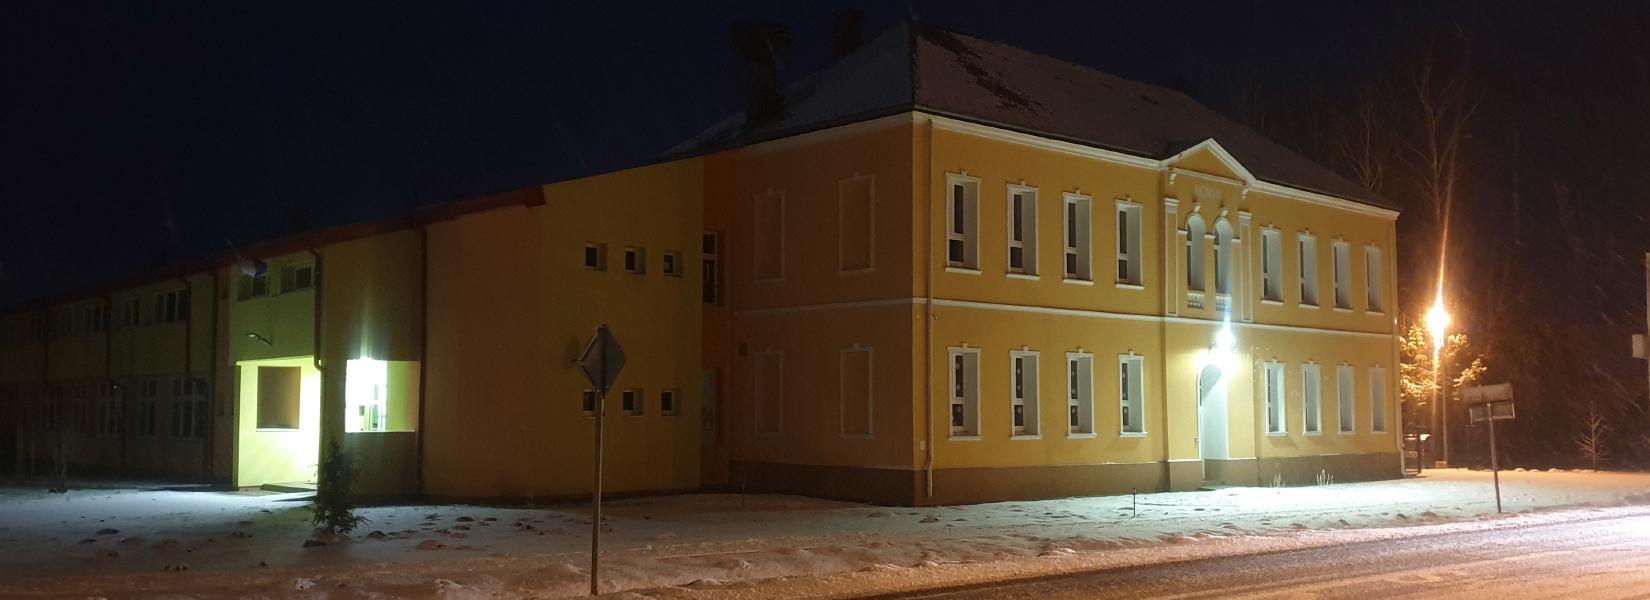 Osnova škola August Cesarec 01-2019